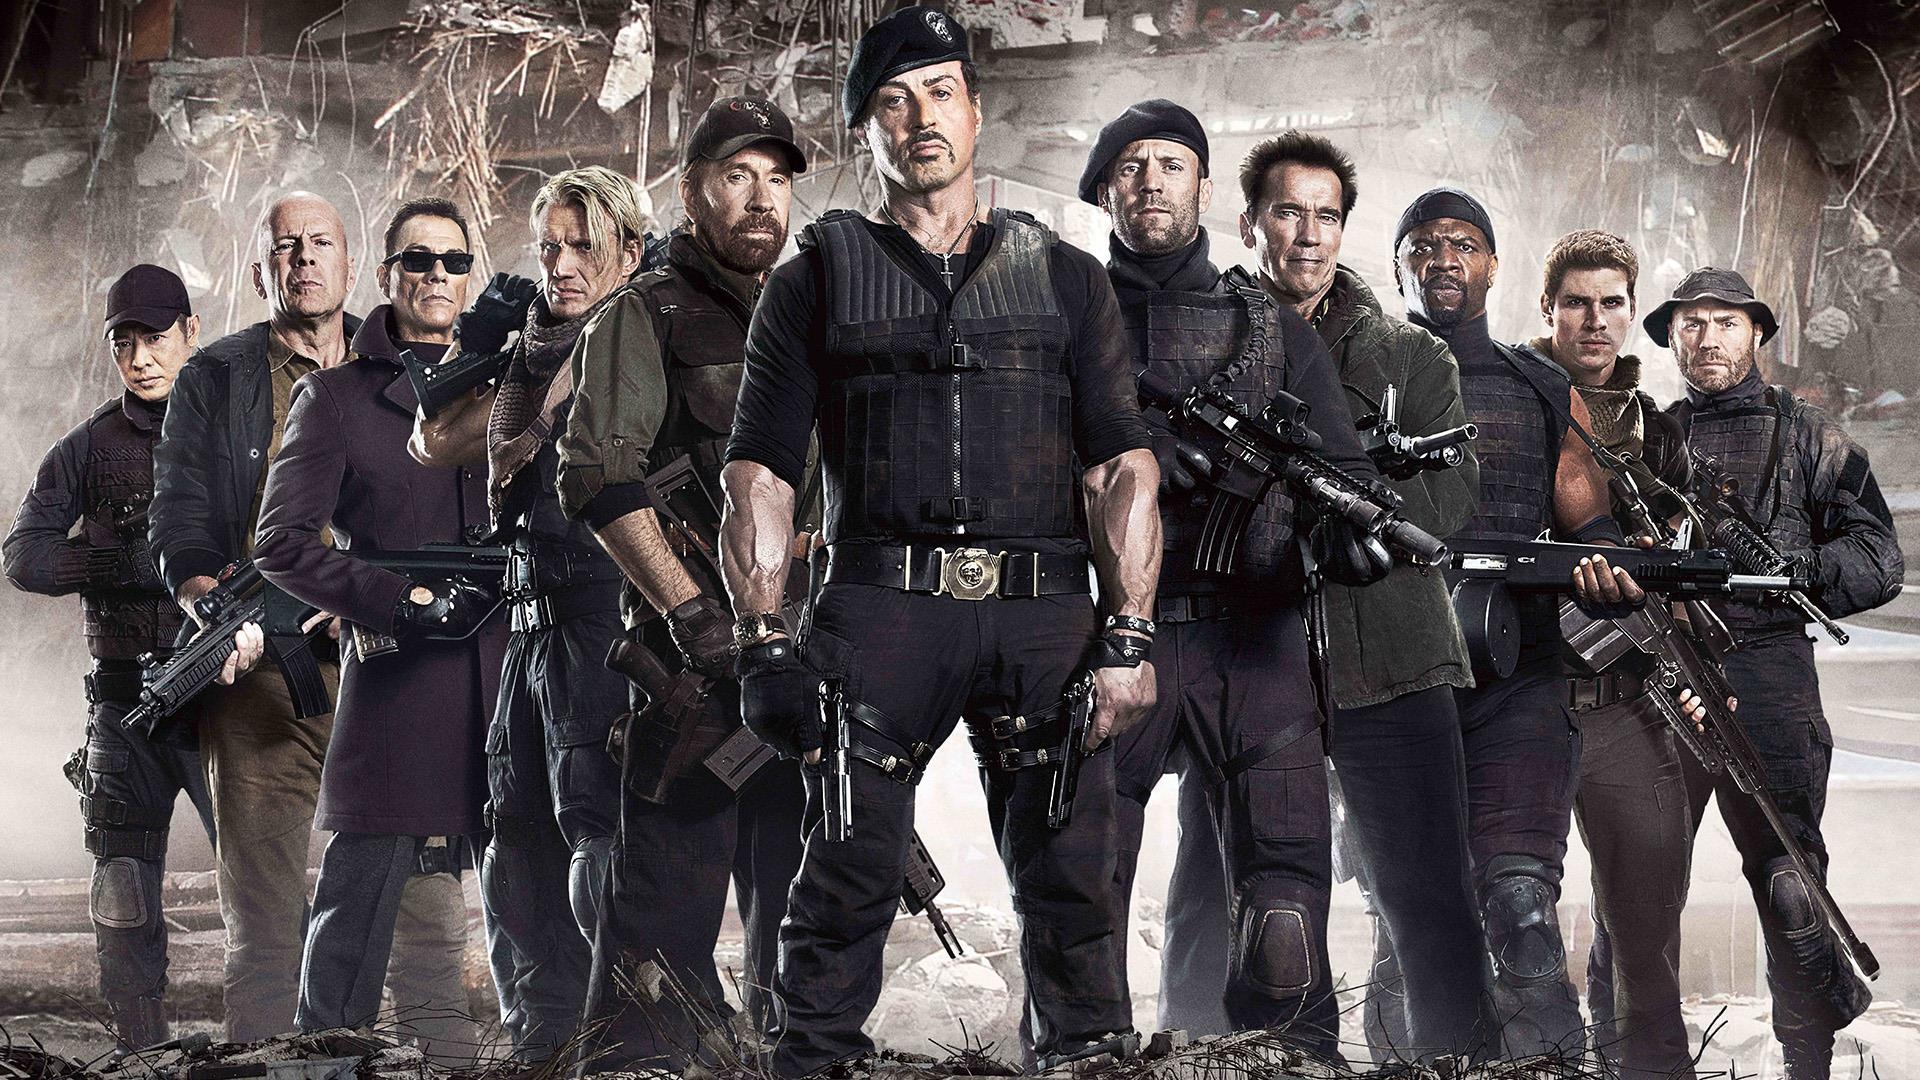 Il cast dei Mercenari 2